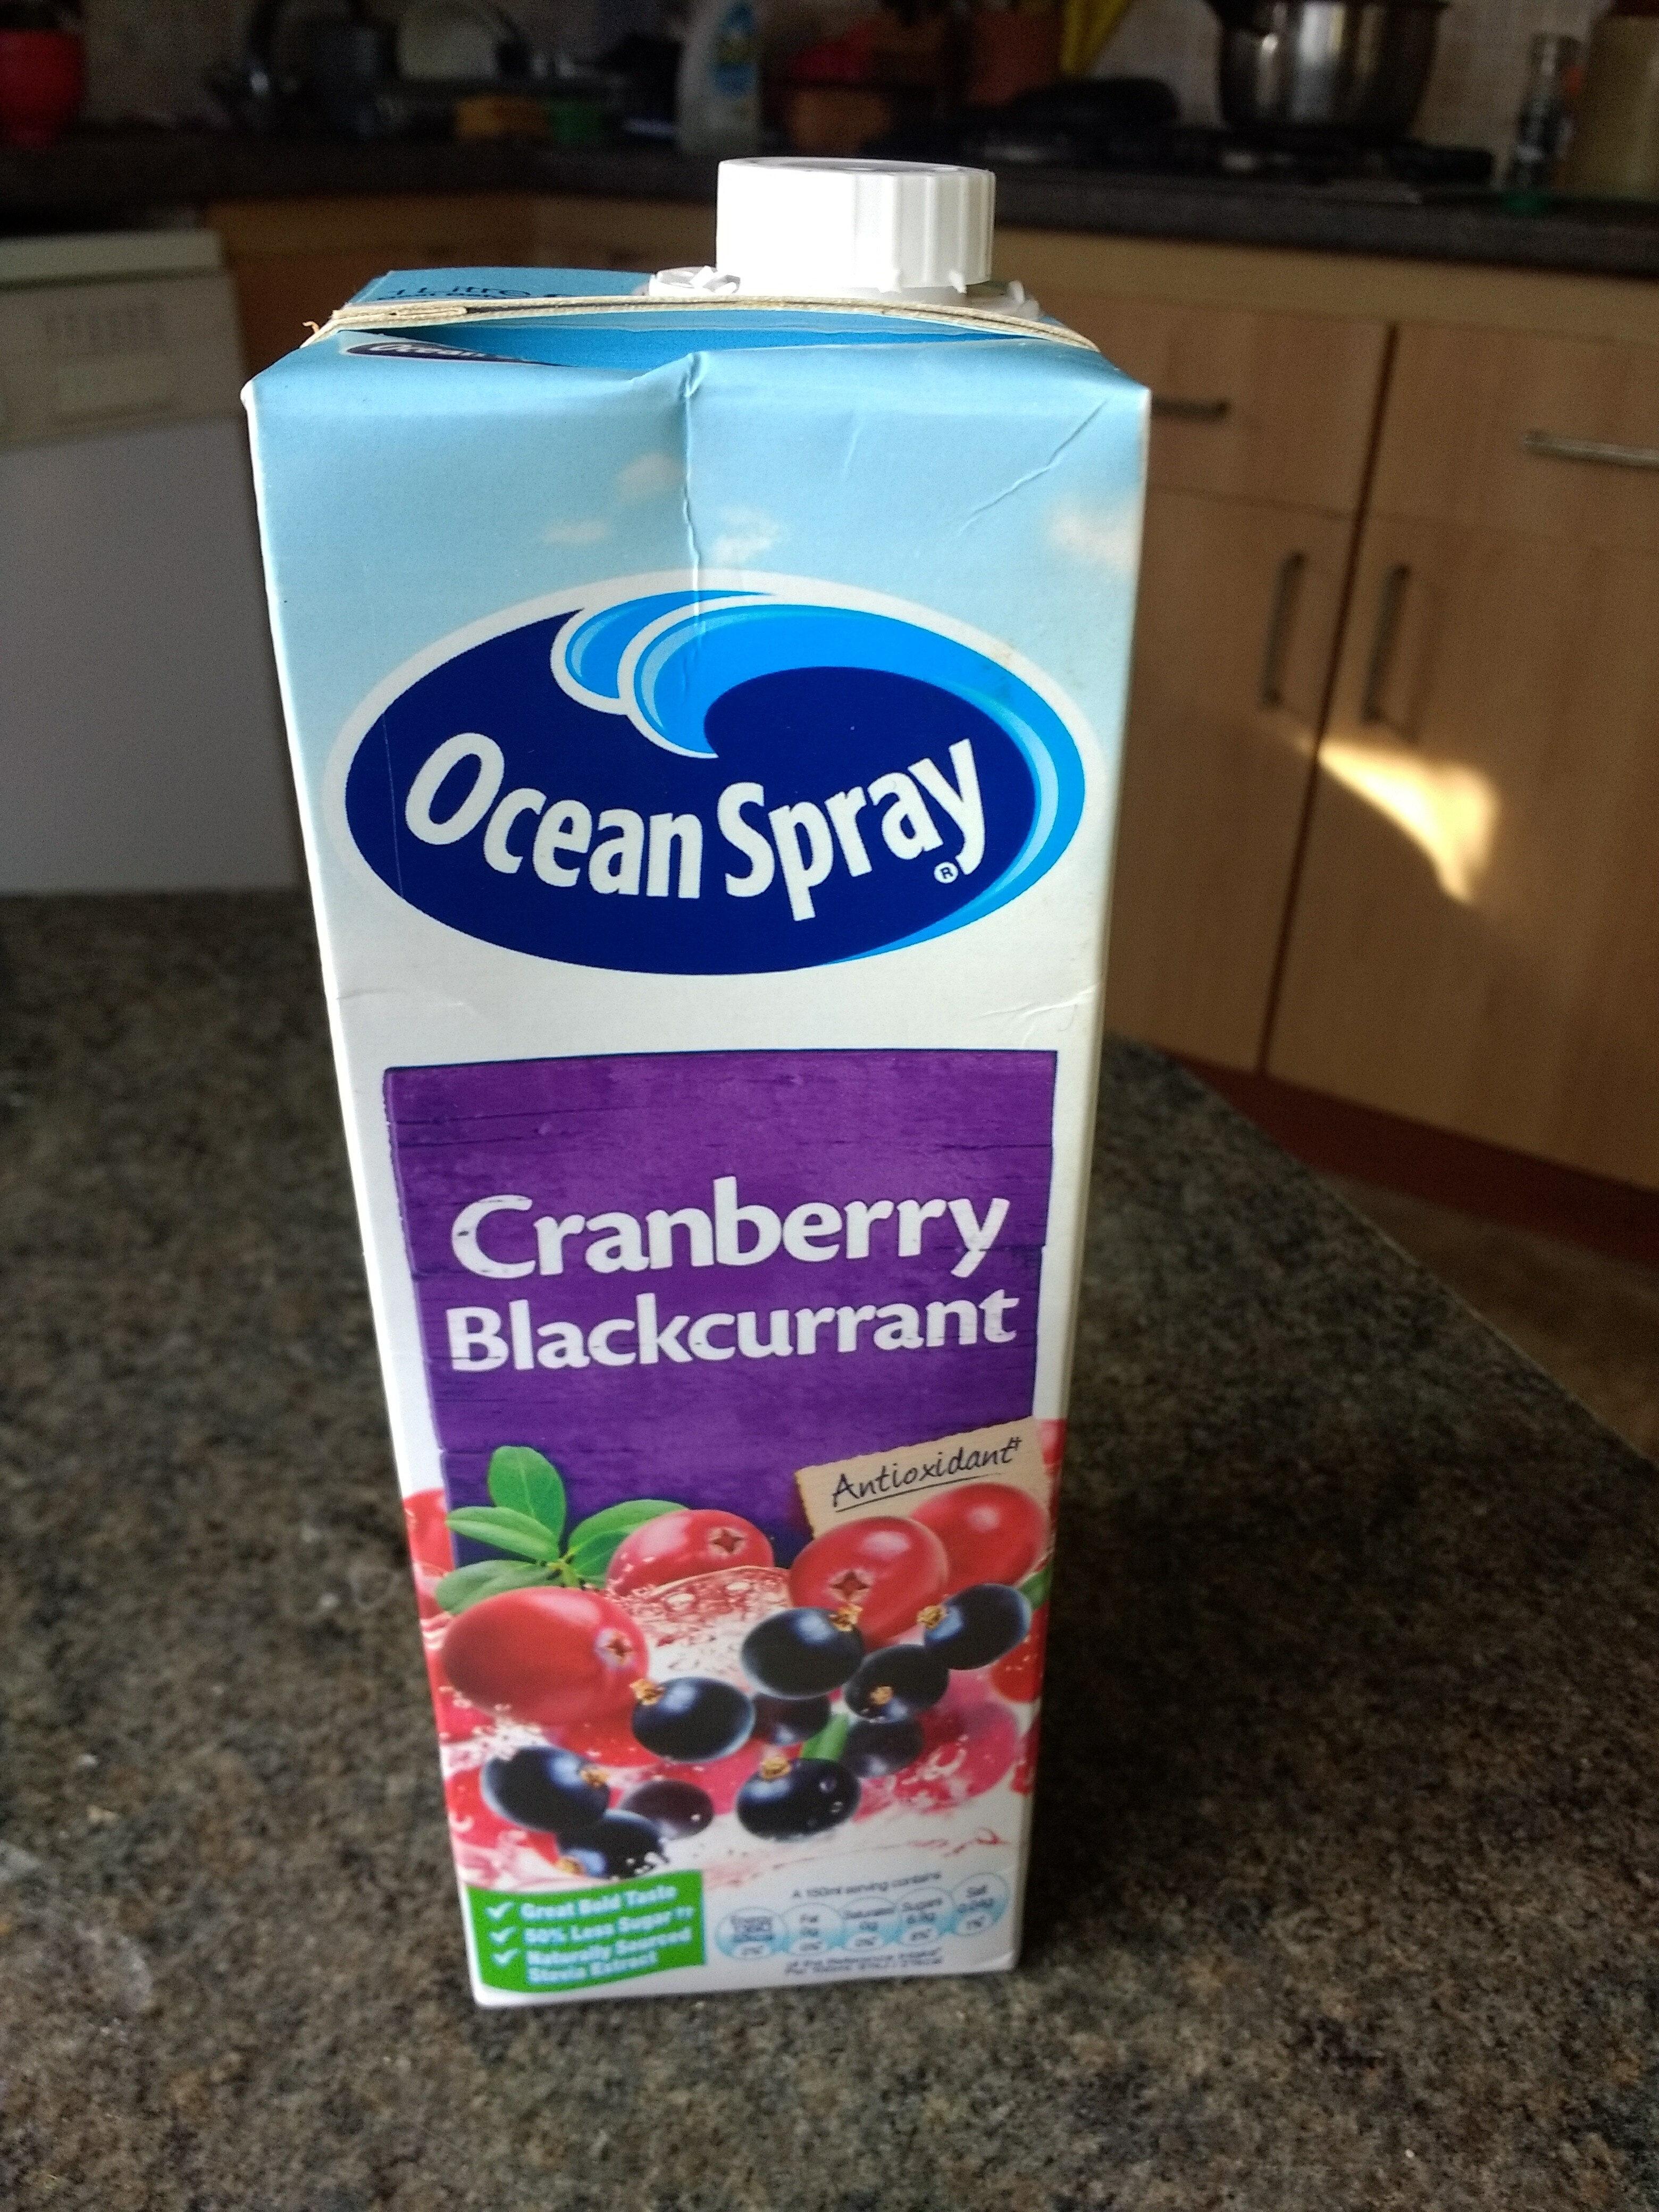 Ocean Spray cranberry blackcurrant - Product - en